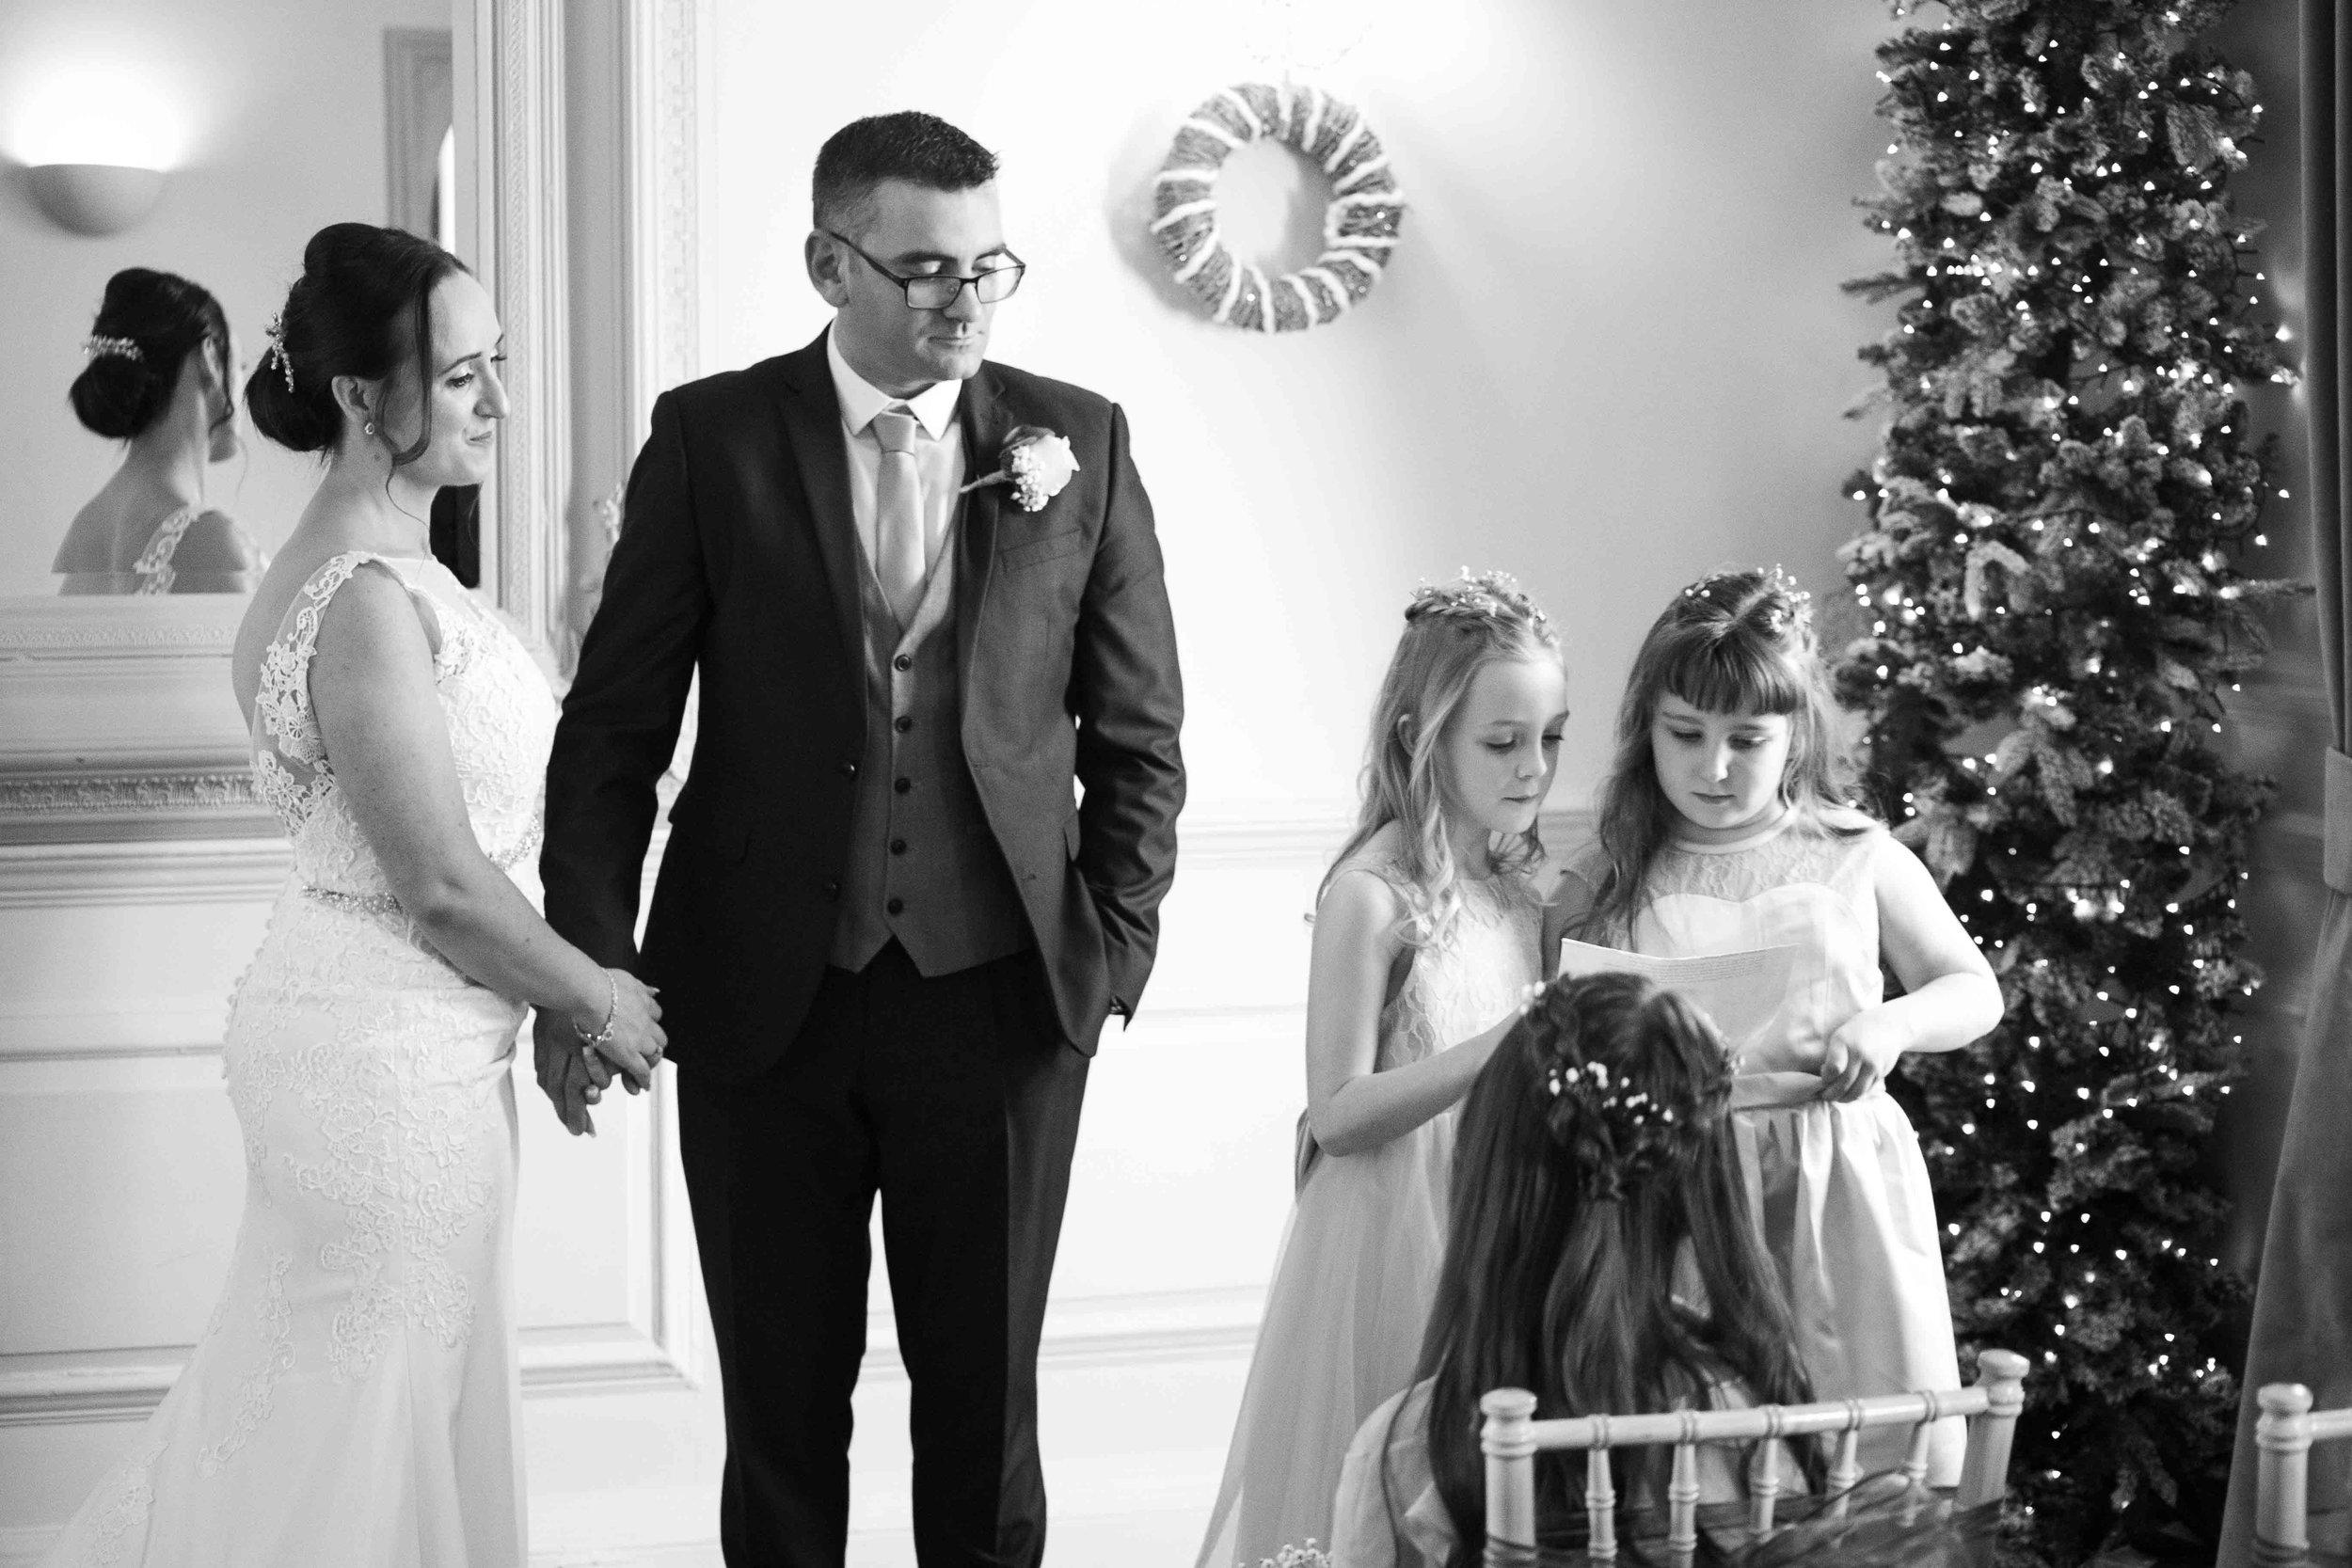 wedding-photos-willenhall-wedding-photographer-wolverhampton-wedding-photographer-west-midlands-wedding-photographer-birmingham-residence-restraunt-and-bar.jpg